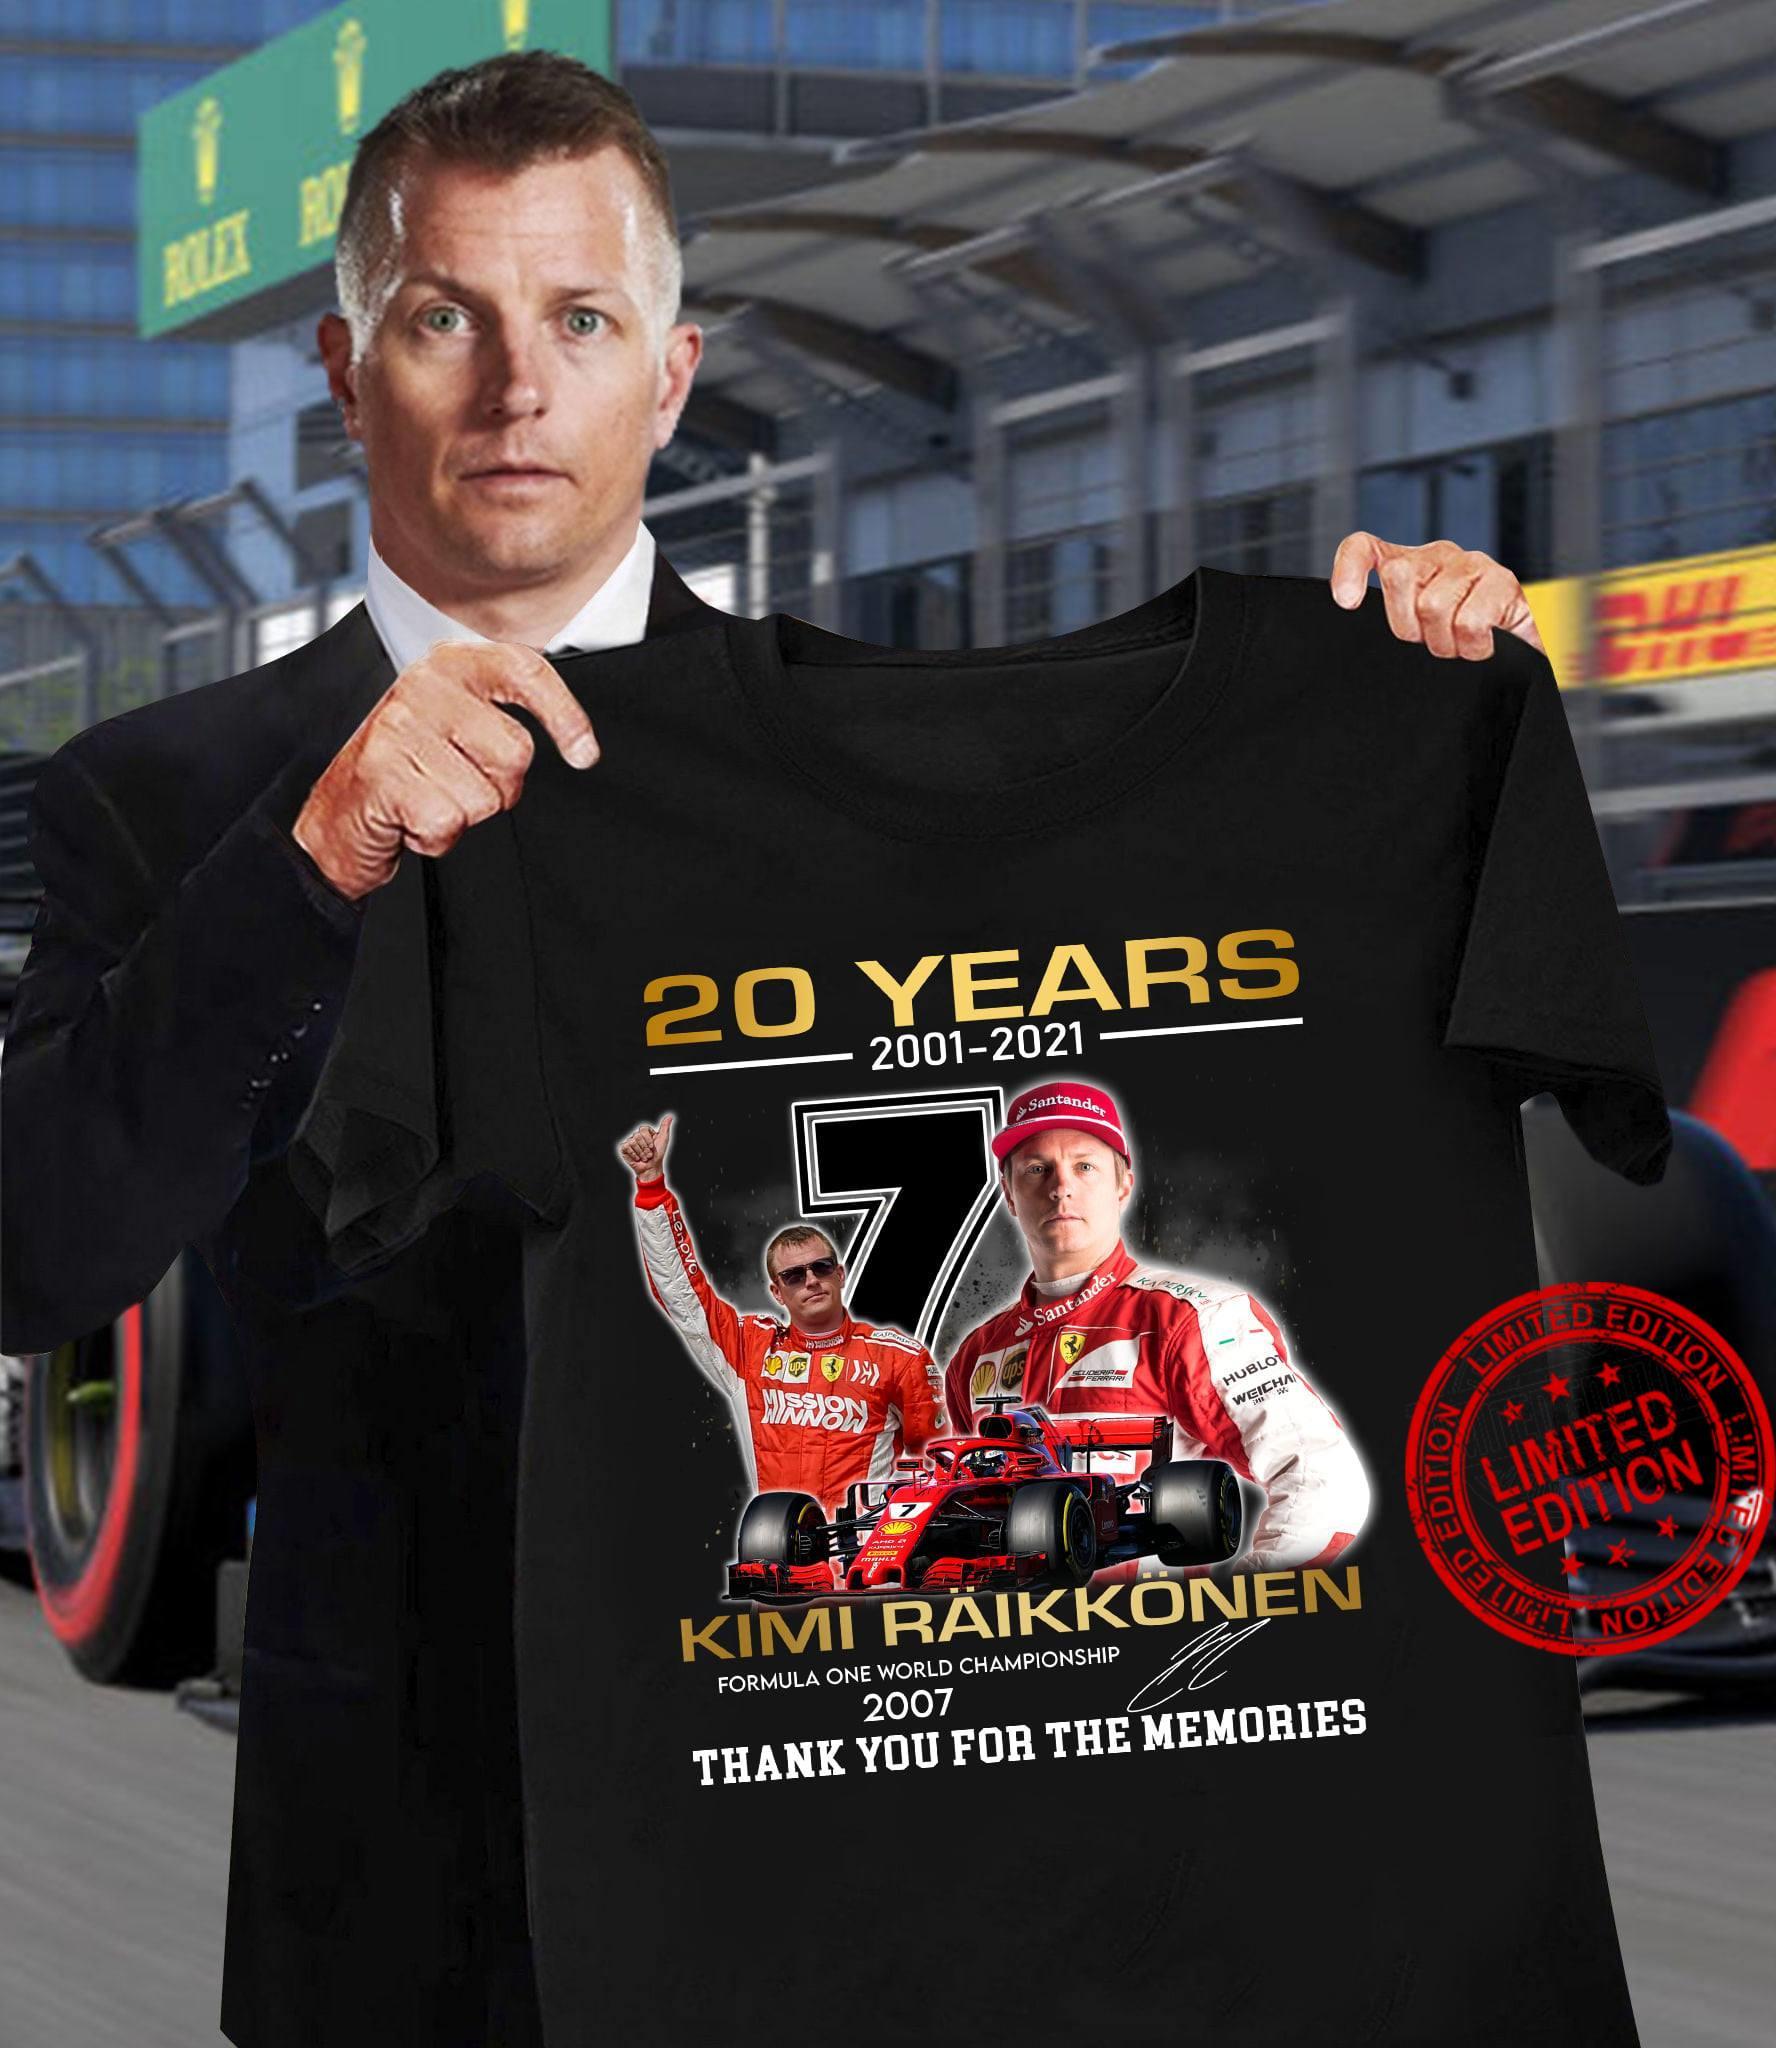 20 Years 2001 2021 Kimi Raikkonen 2007 Thank You For The Memories Shirt